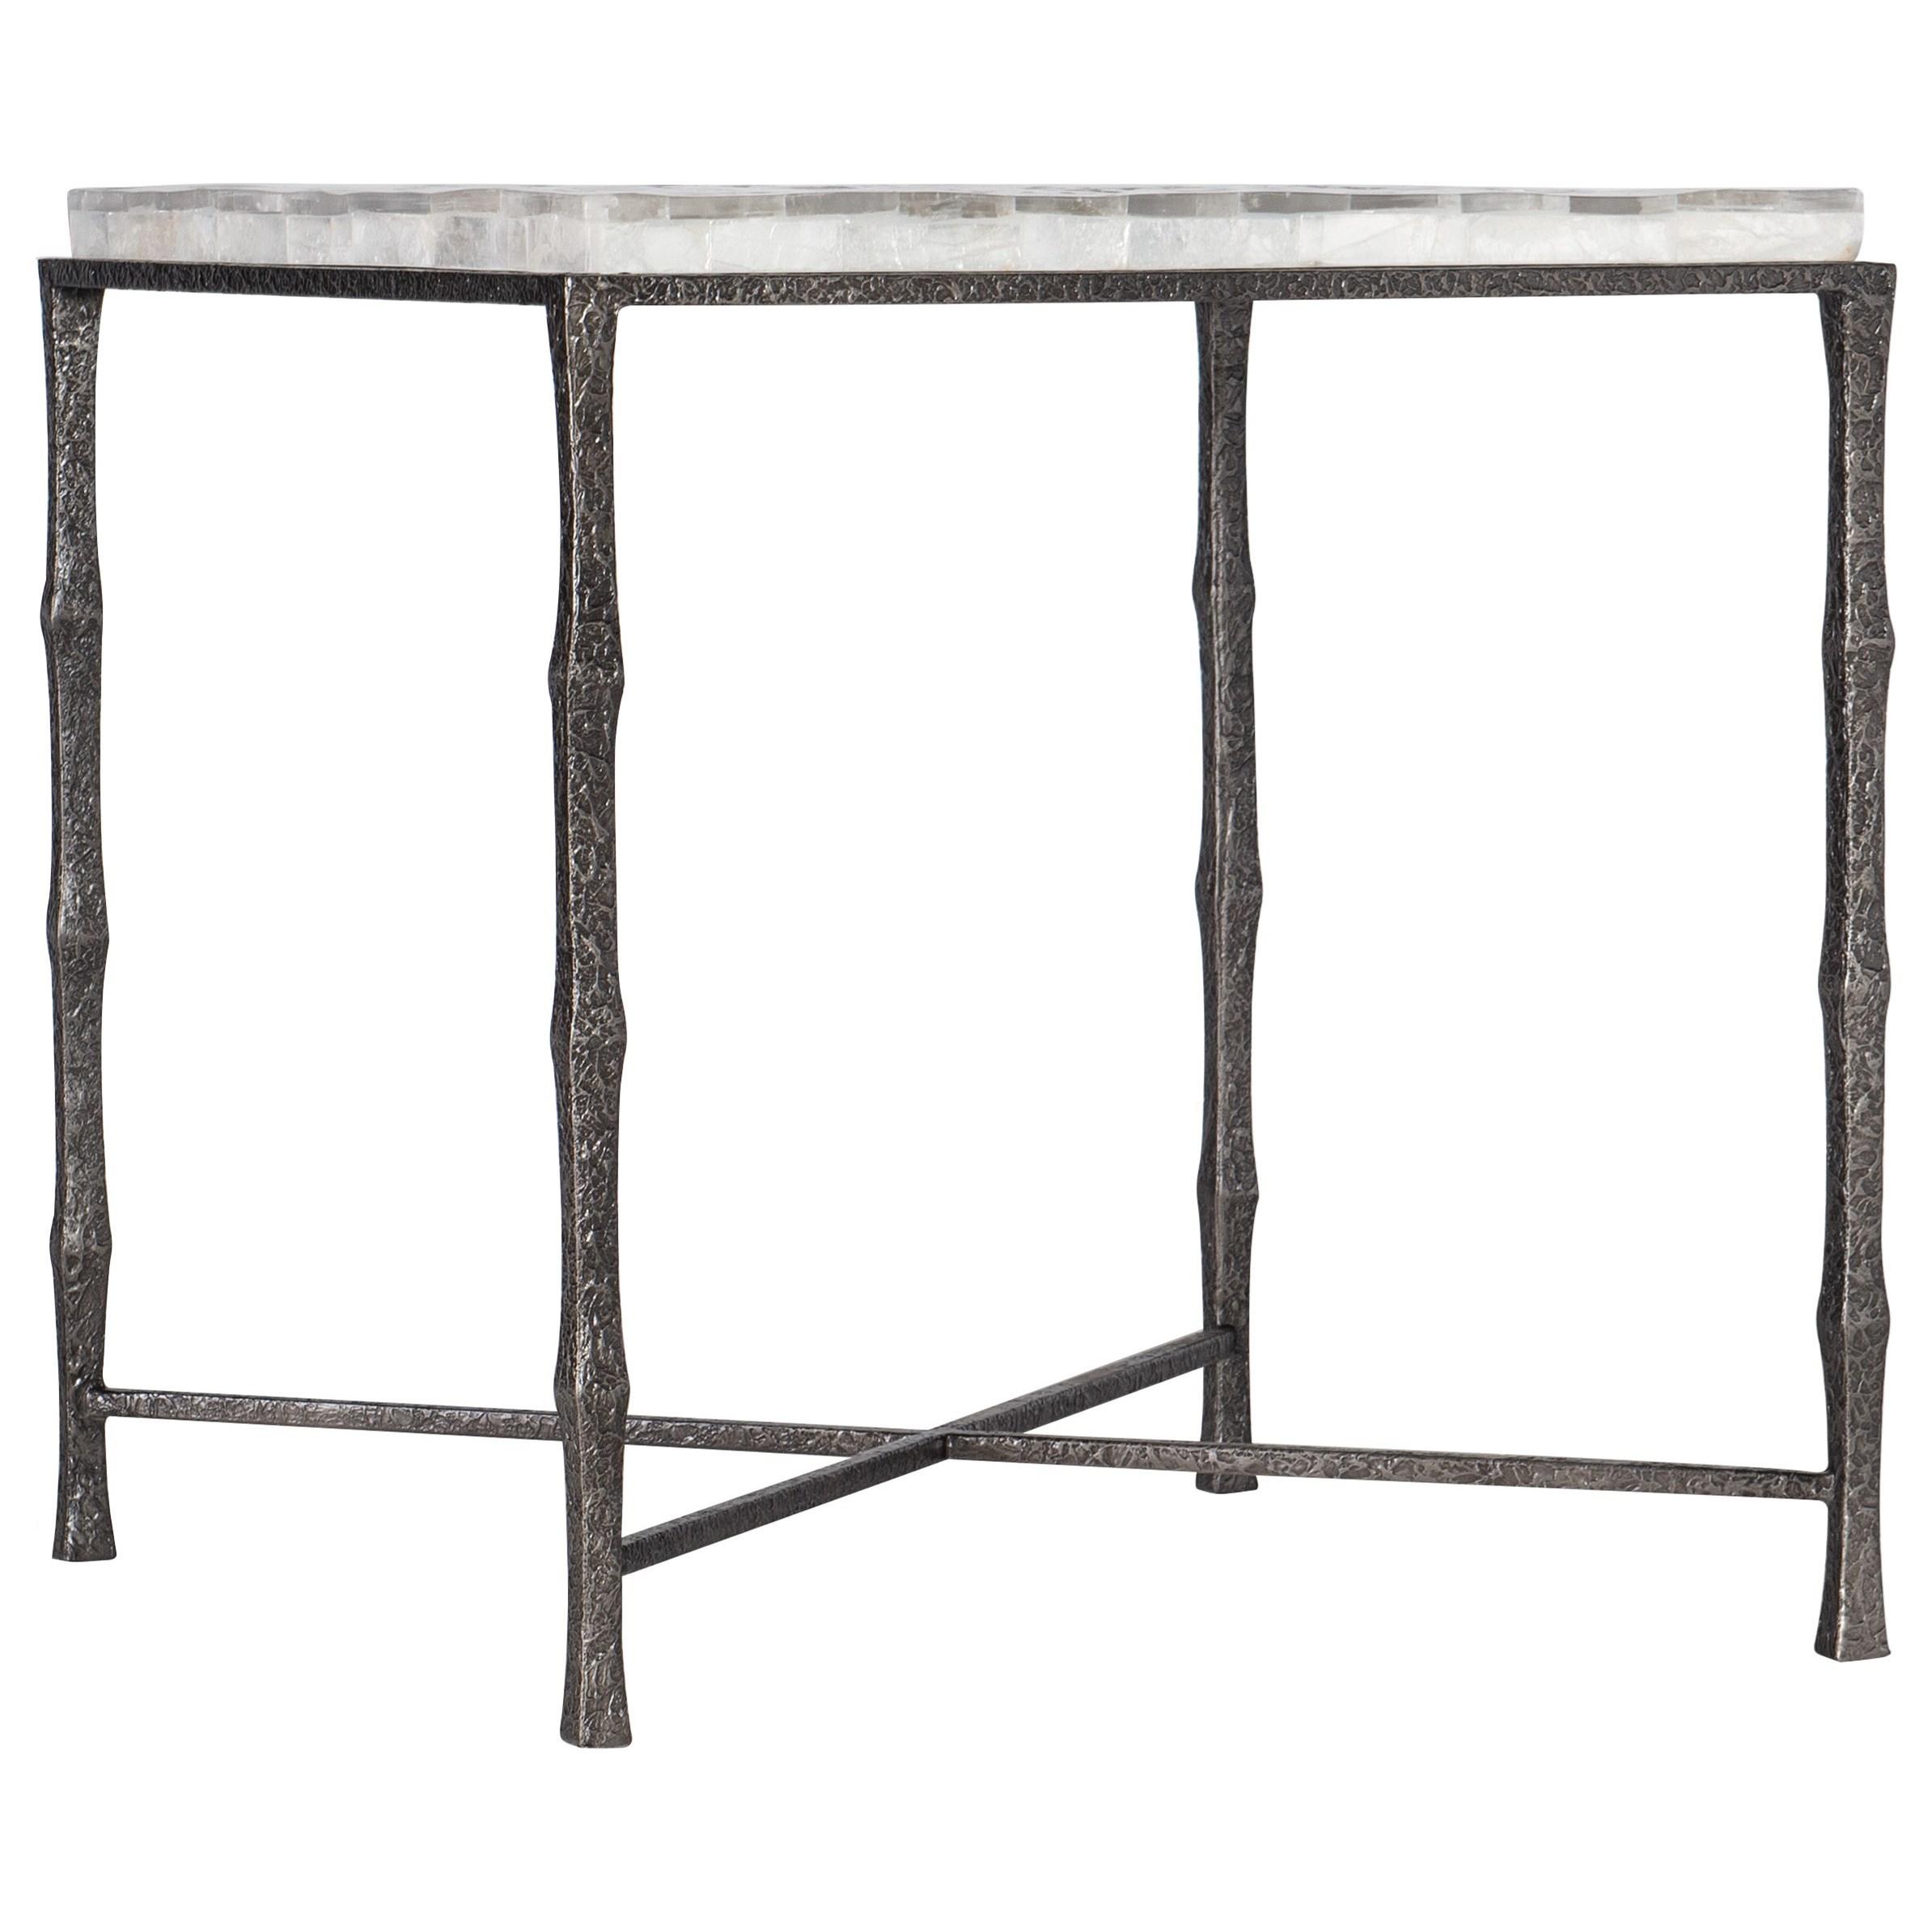 Surfrider End Table by Hooker Furniture at Miller Waldrop Furniture and Decor